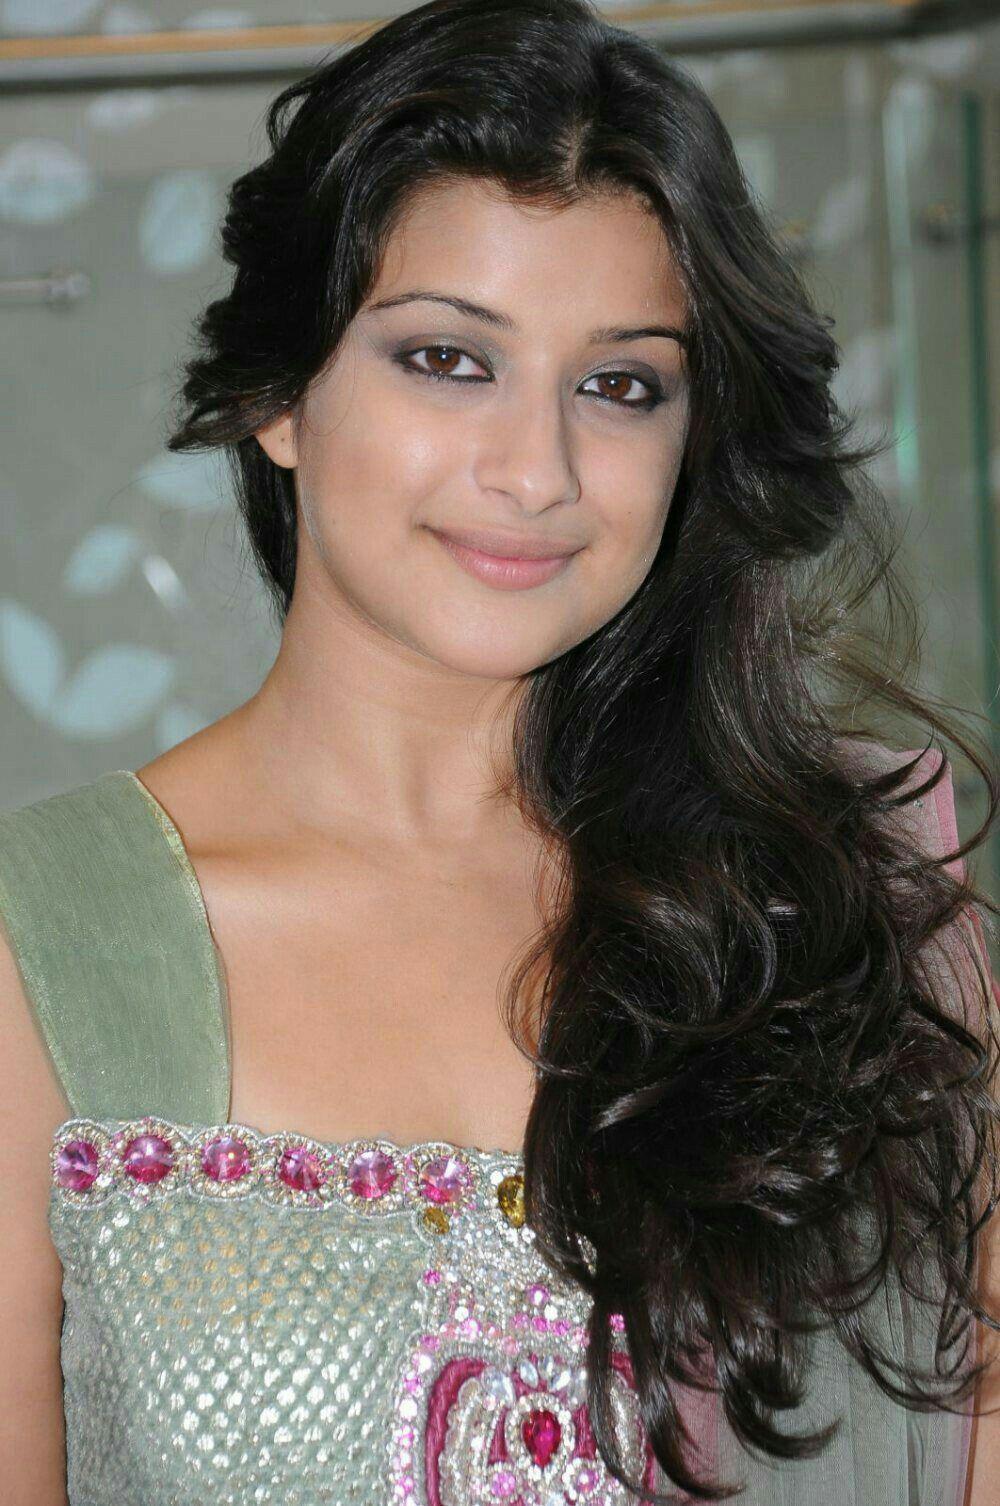 Top 15 South Indian Actress Bikini Images-Sexiest Bikini